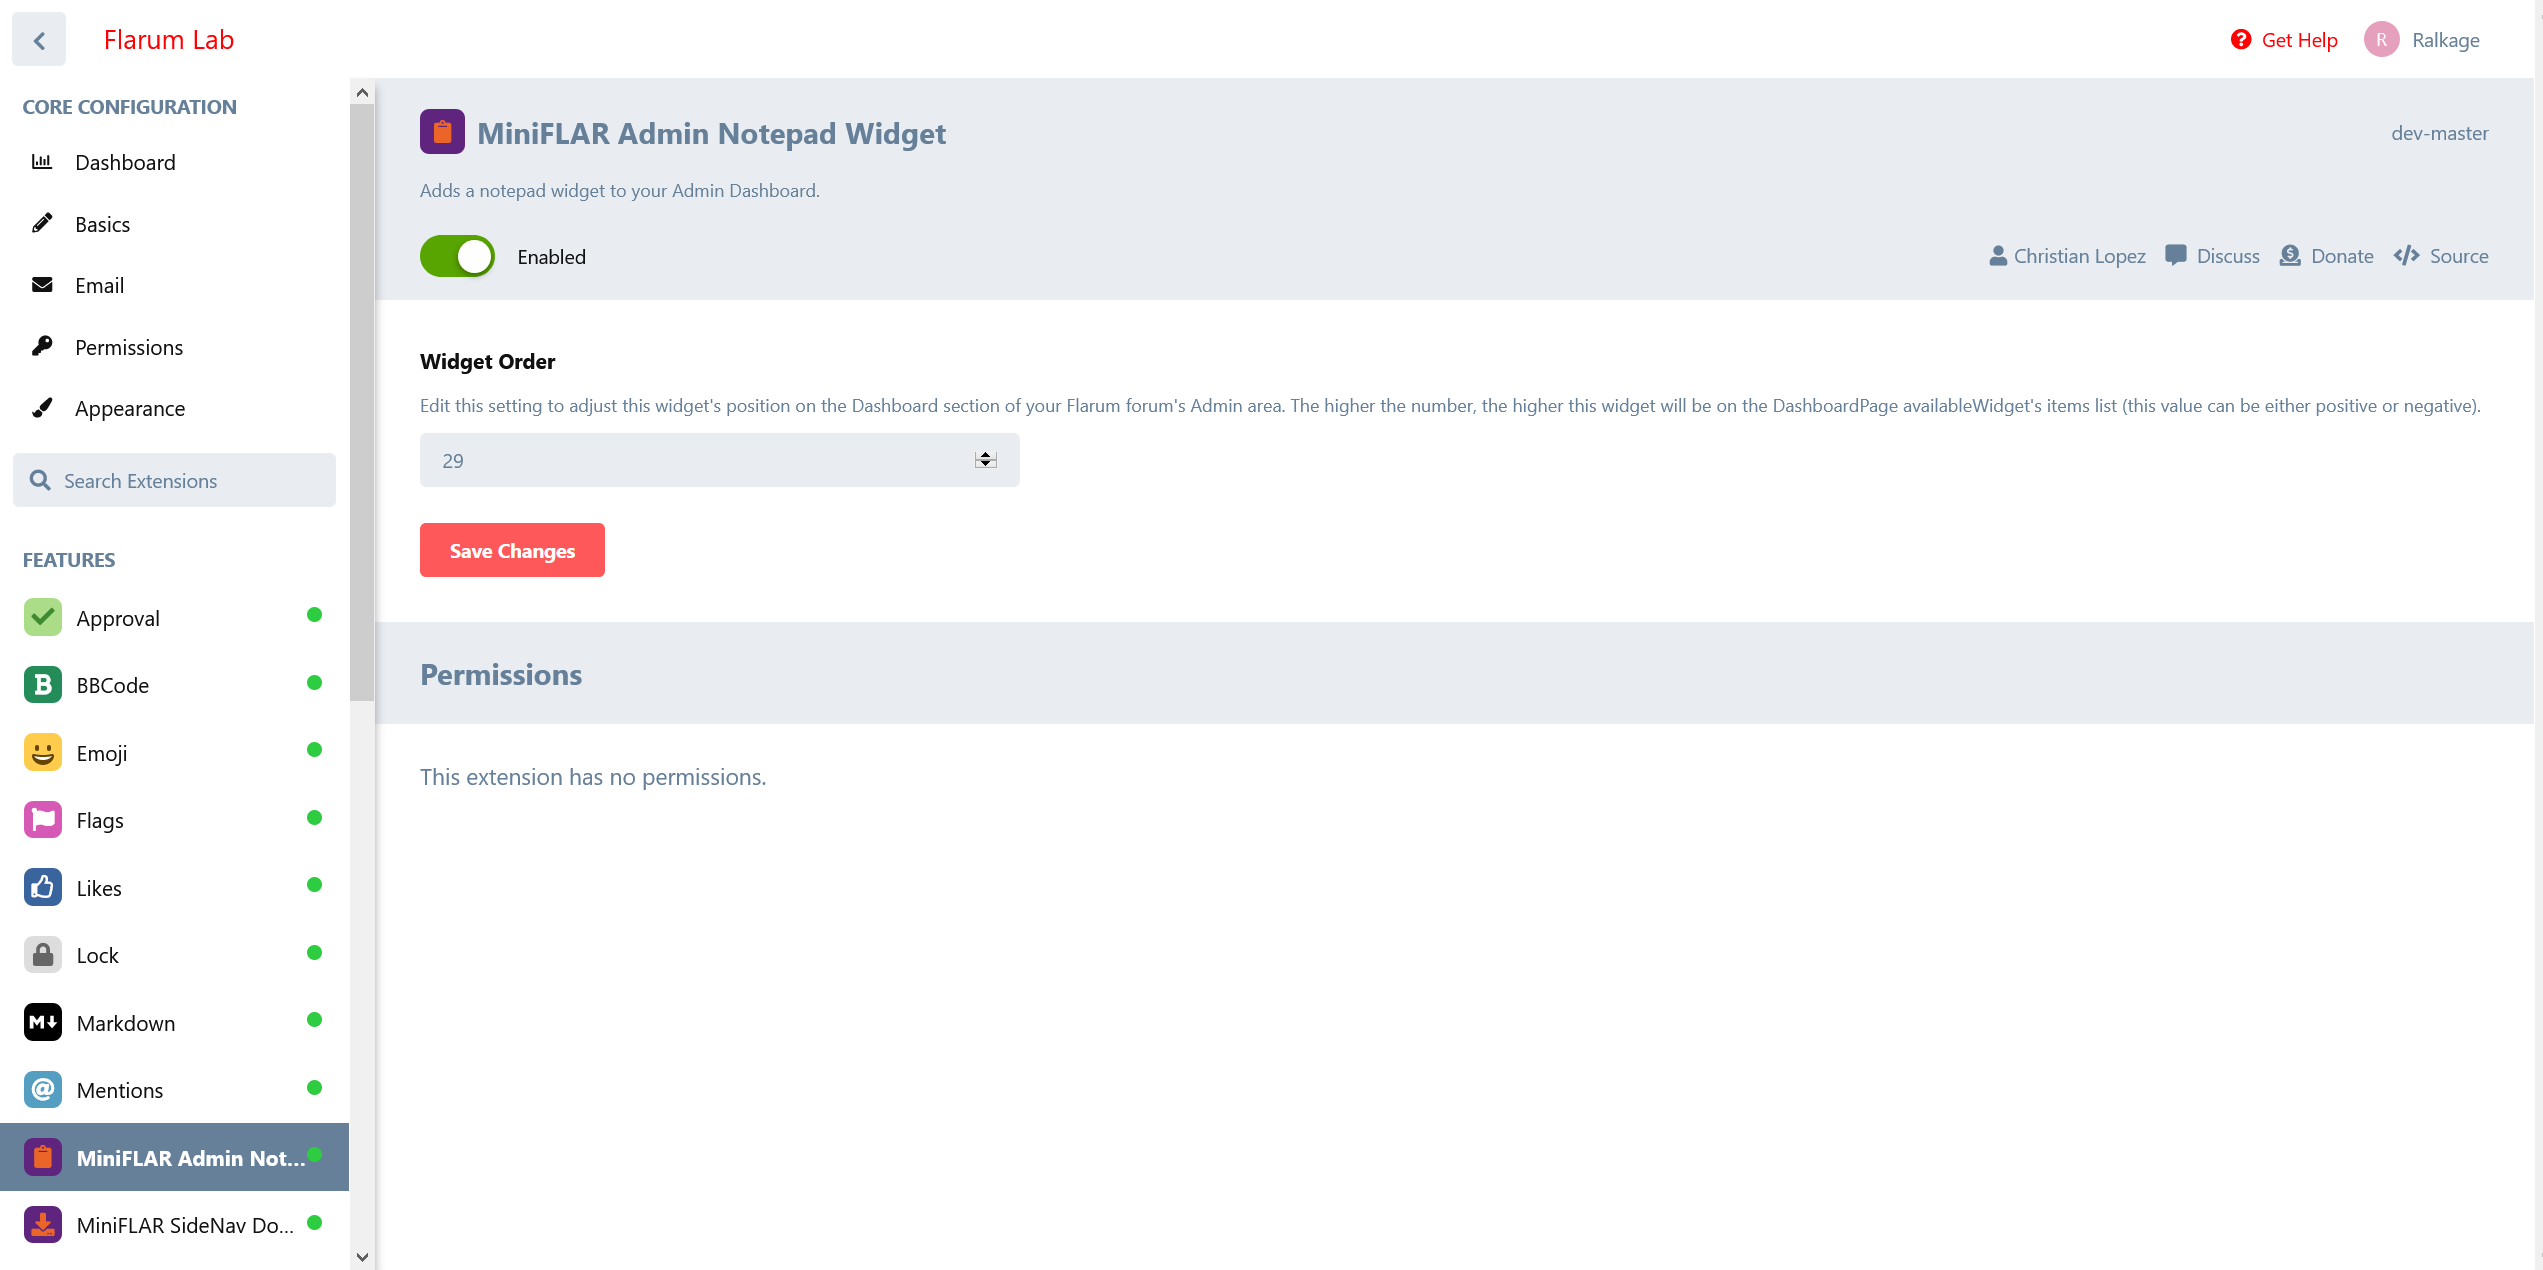 miniFLAR Admin Notepad Widget Settings